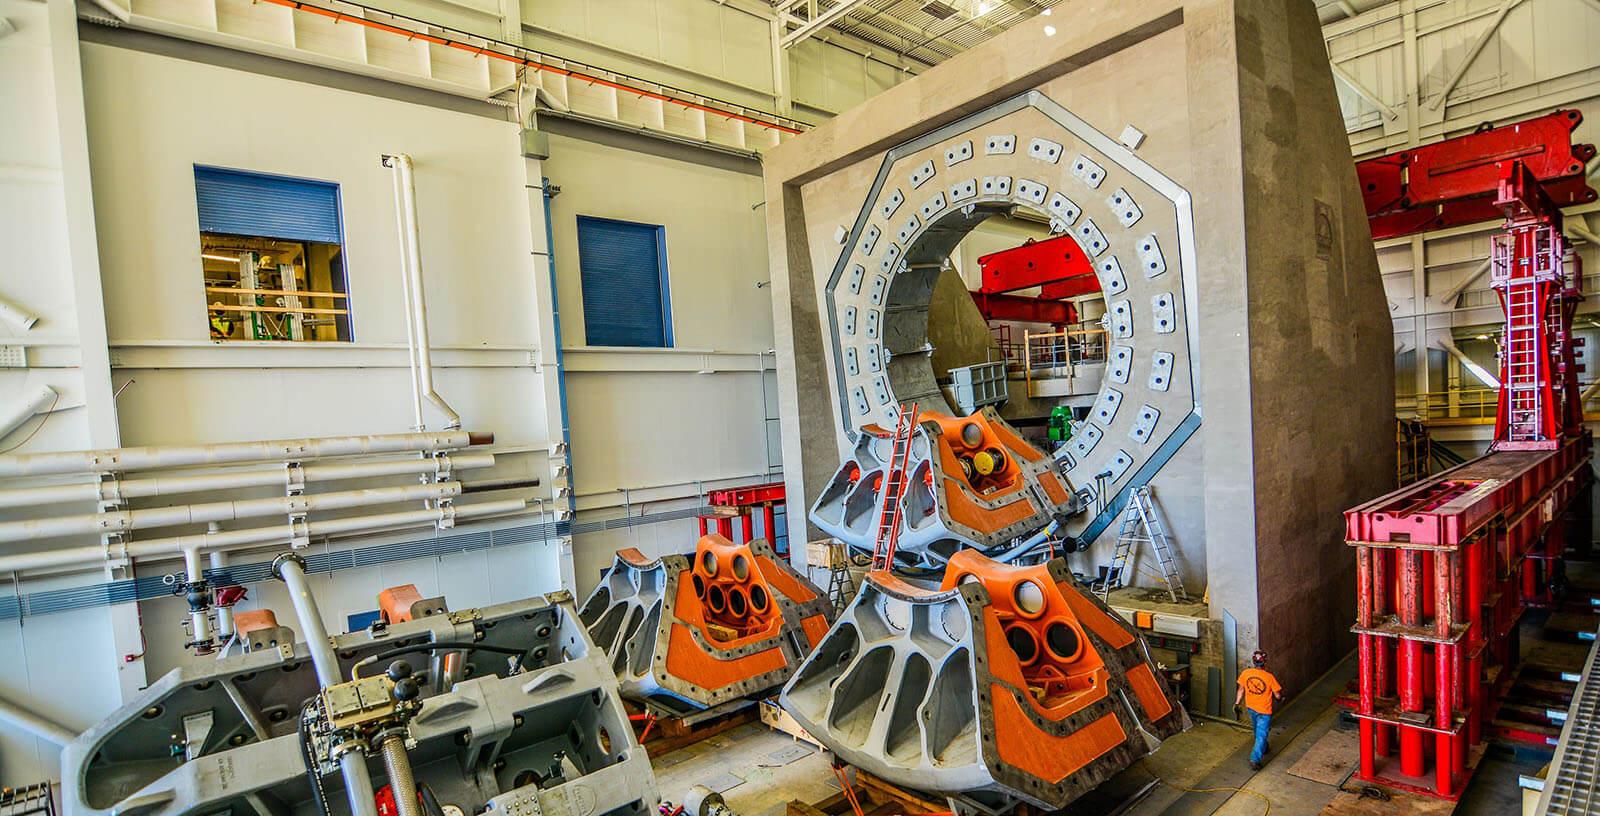 CLEMSON_Windturbine_drivetrain_test_facility_Test_Rig_USA_ADA_Idom__2_